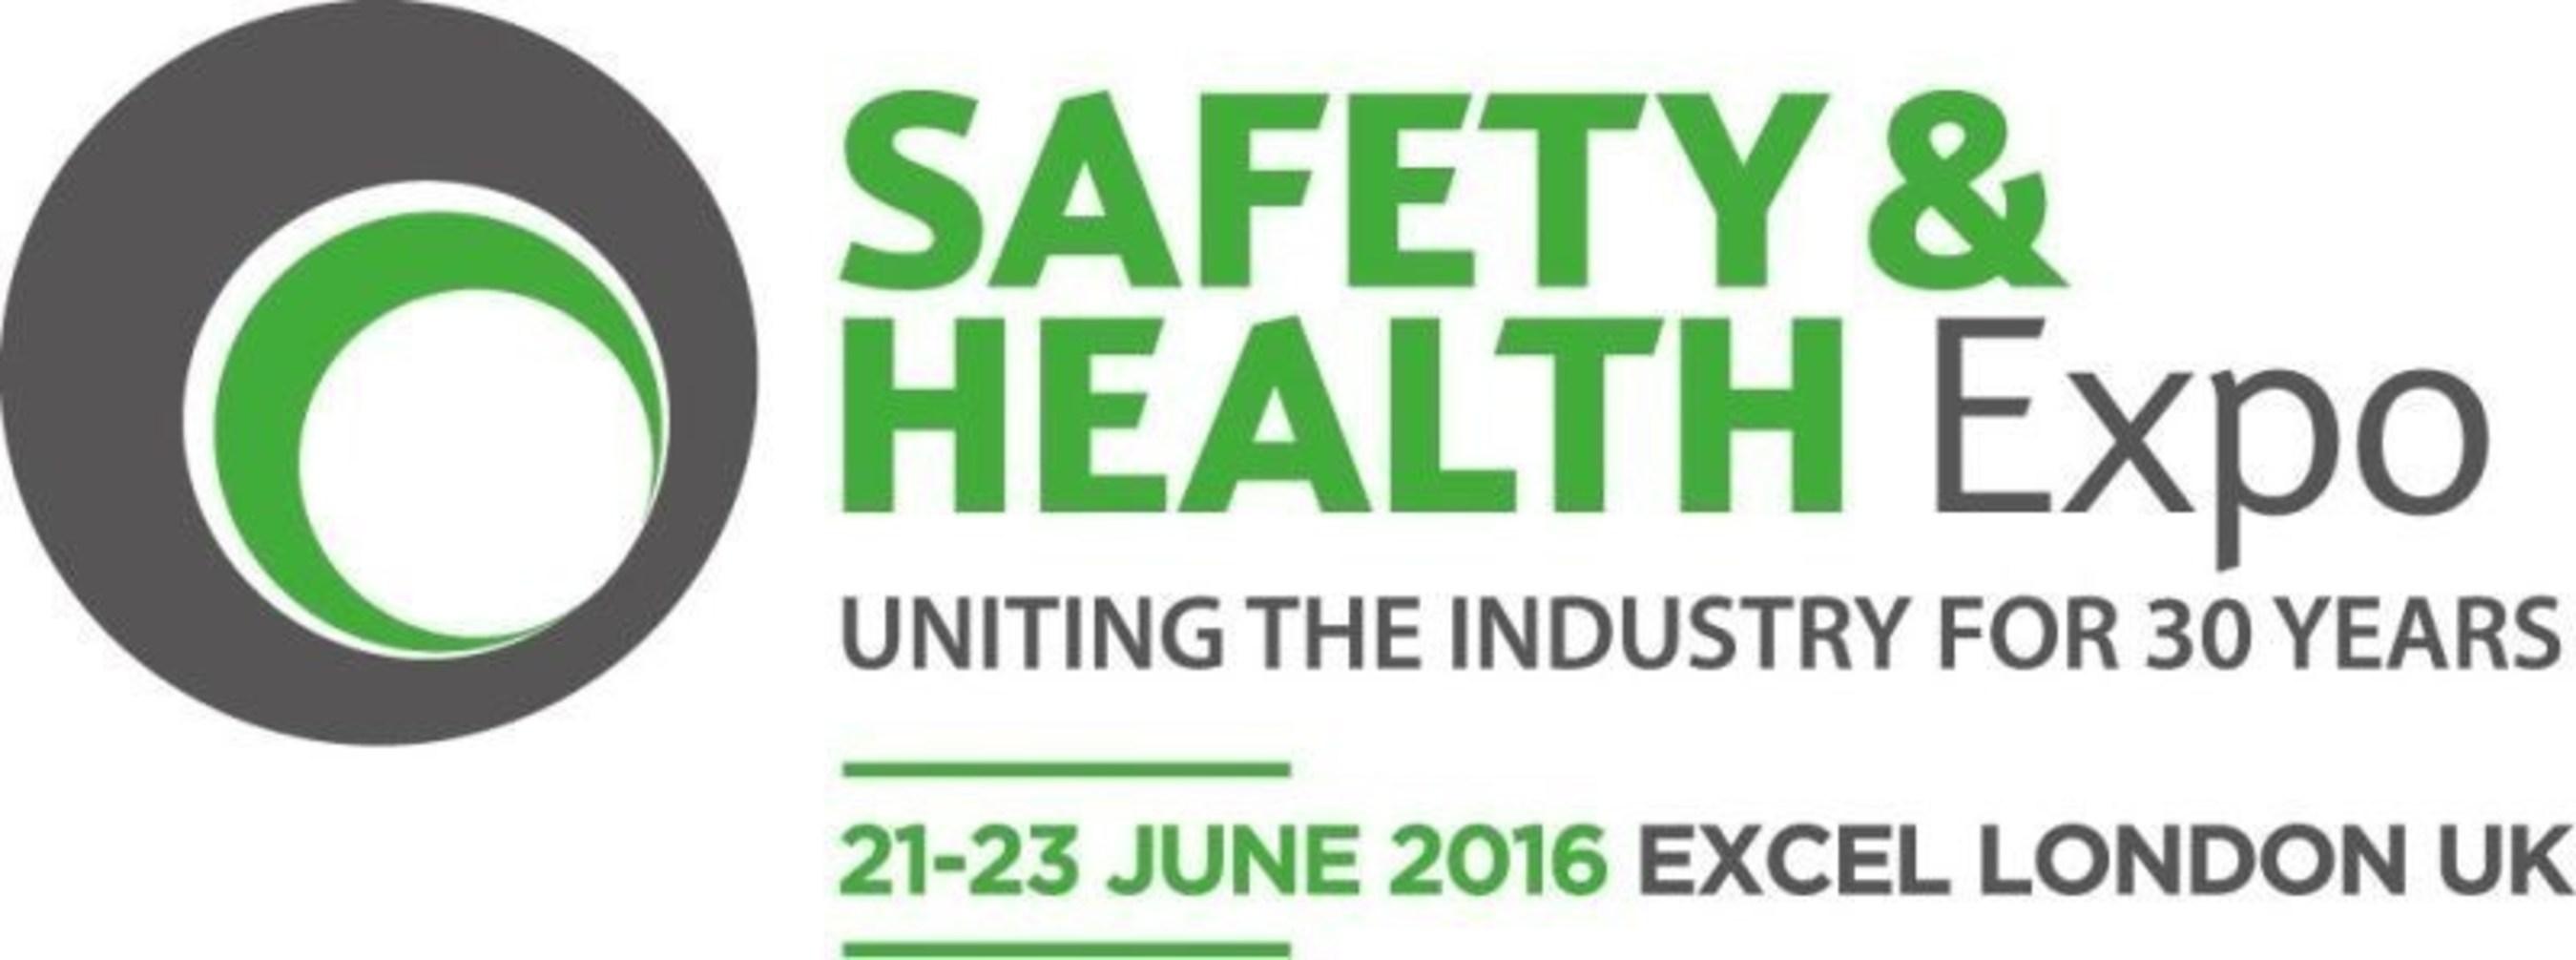 Safety & Health Expo Logo (PRNewsFoto/UBM EMEA) (PRNewsFoto/UBM EMEA)